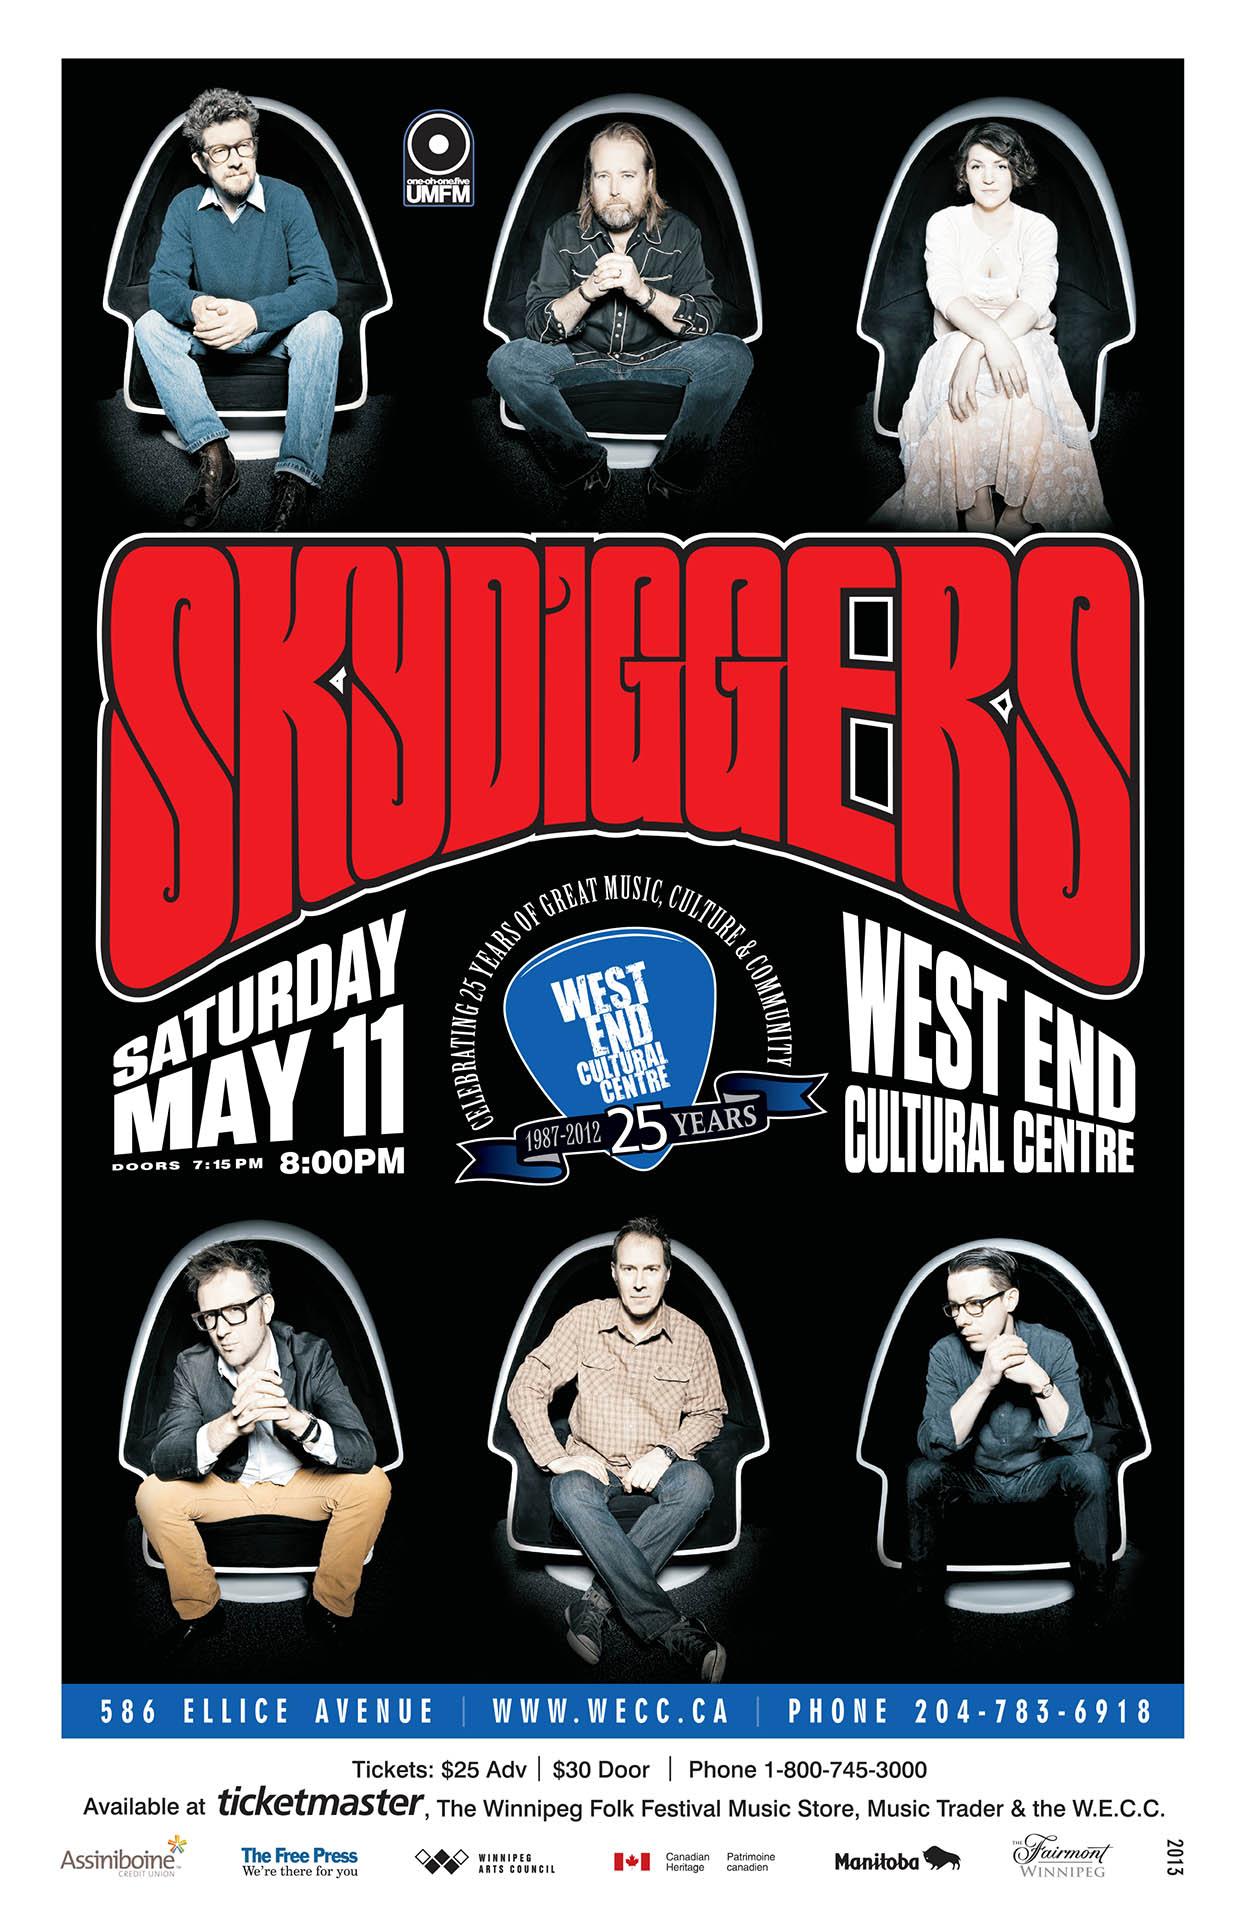 SKYDIGGERS – 2013